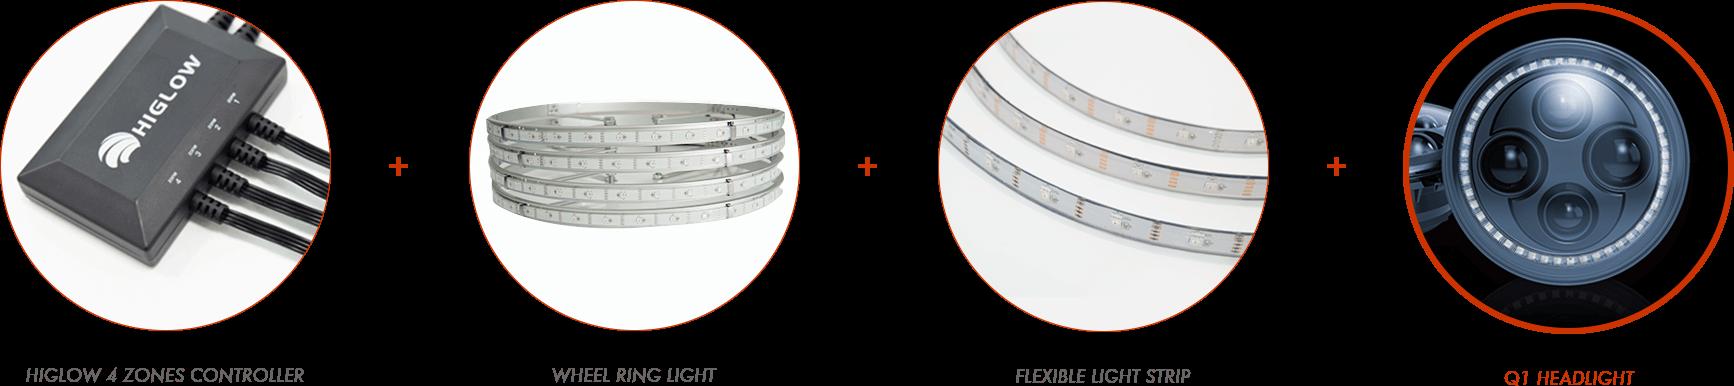 Q1 Wheel ring light ambient Light